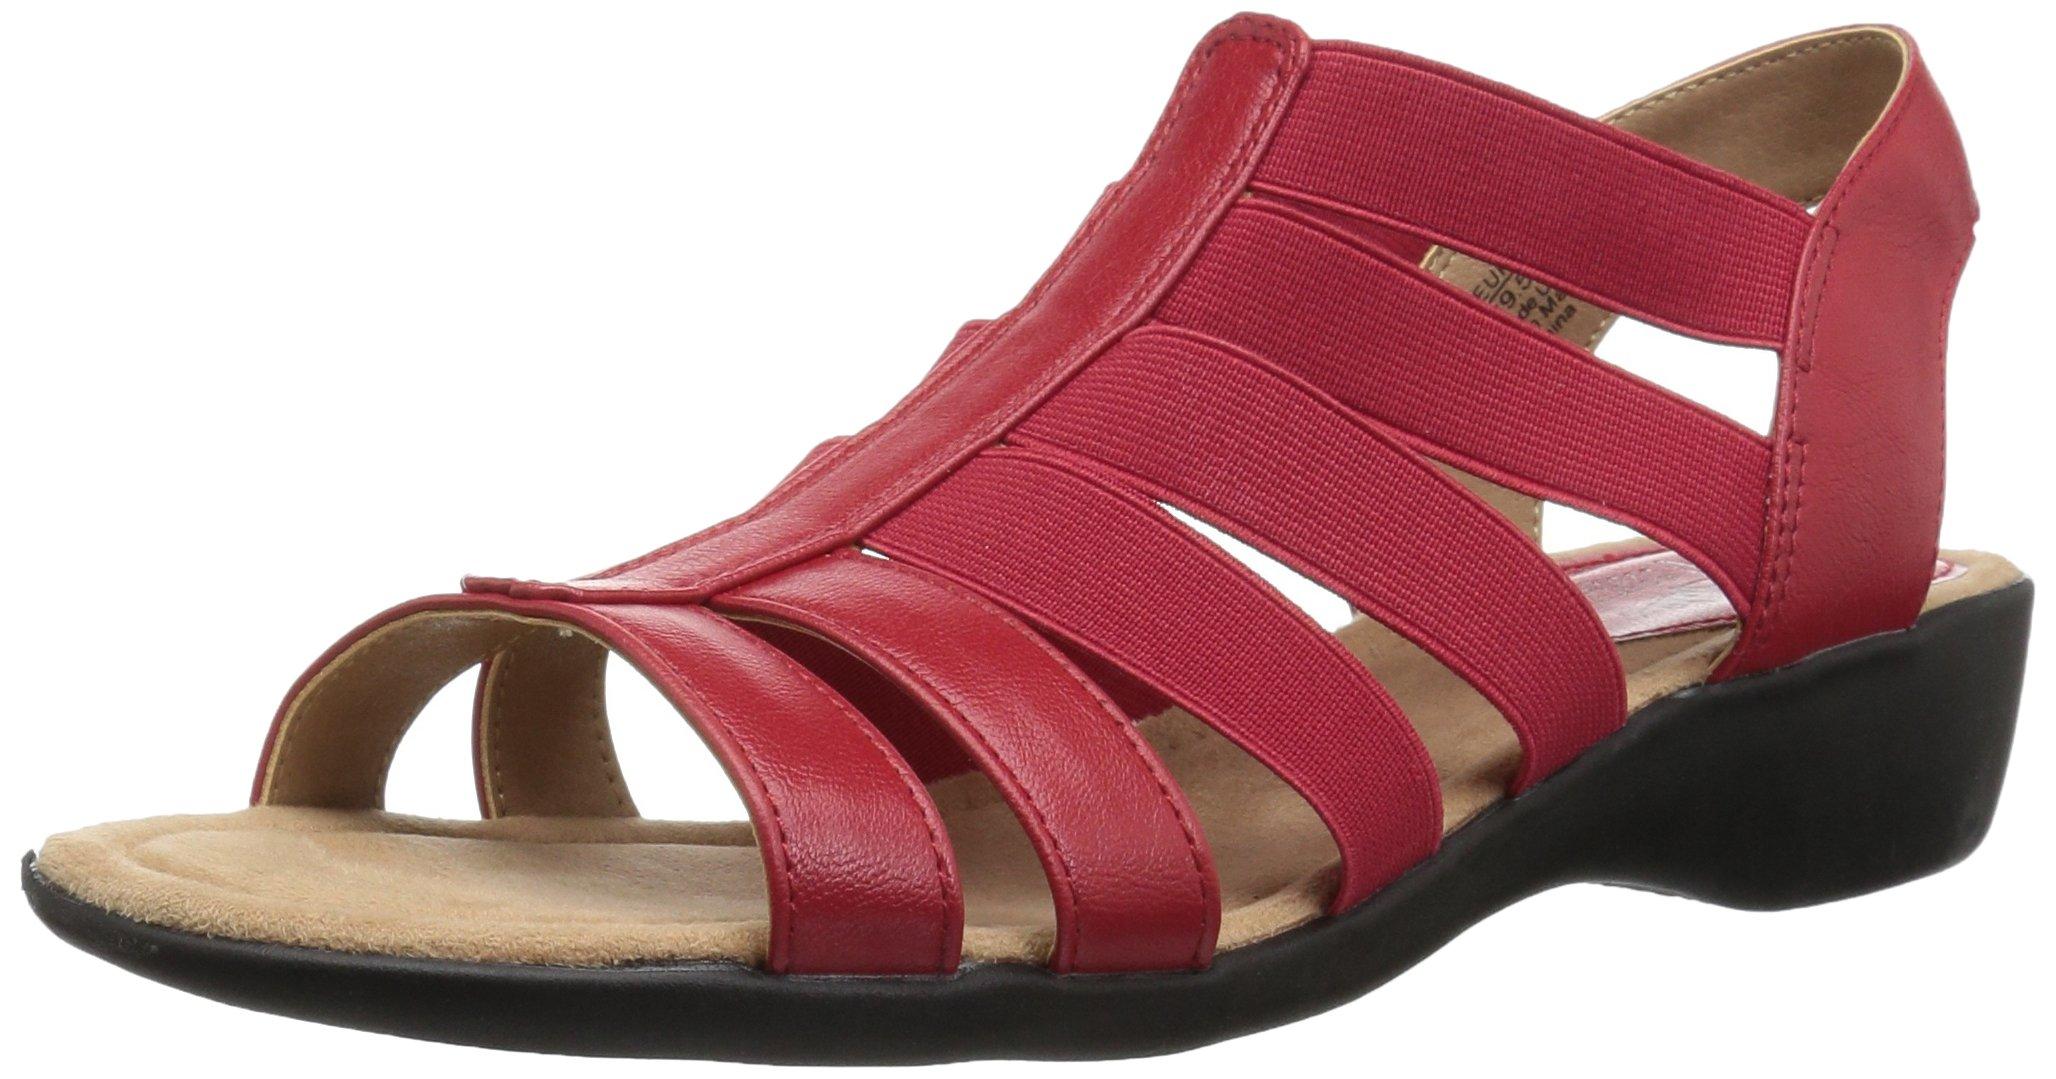 LifeStride Women's Toni Flat Sandal, red, 8 M US